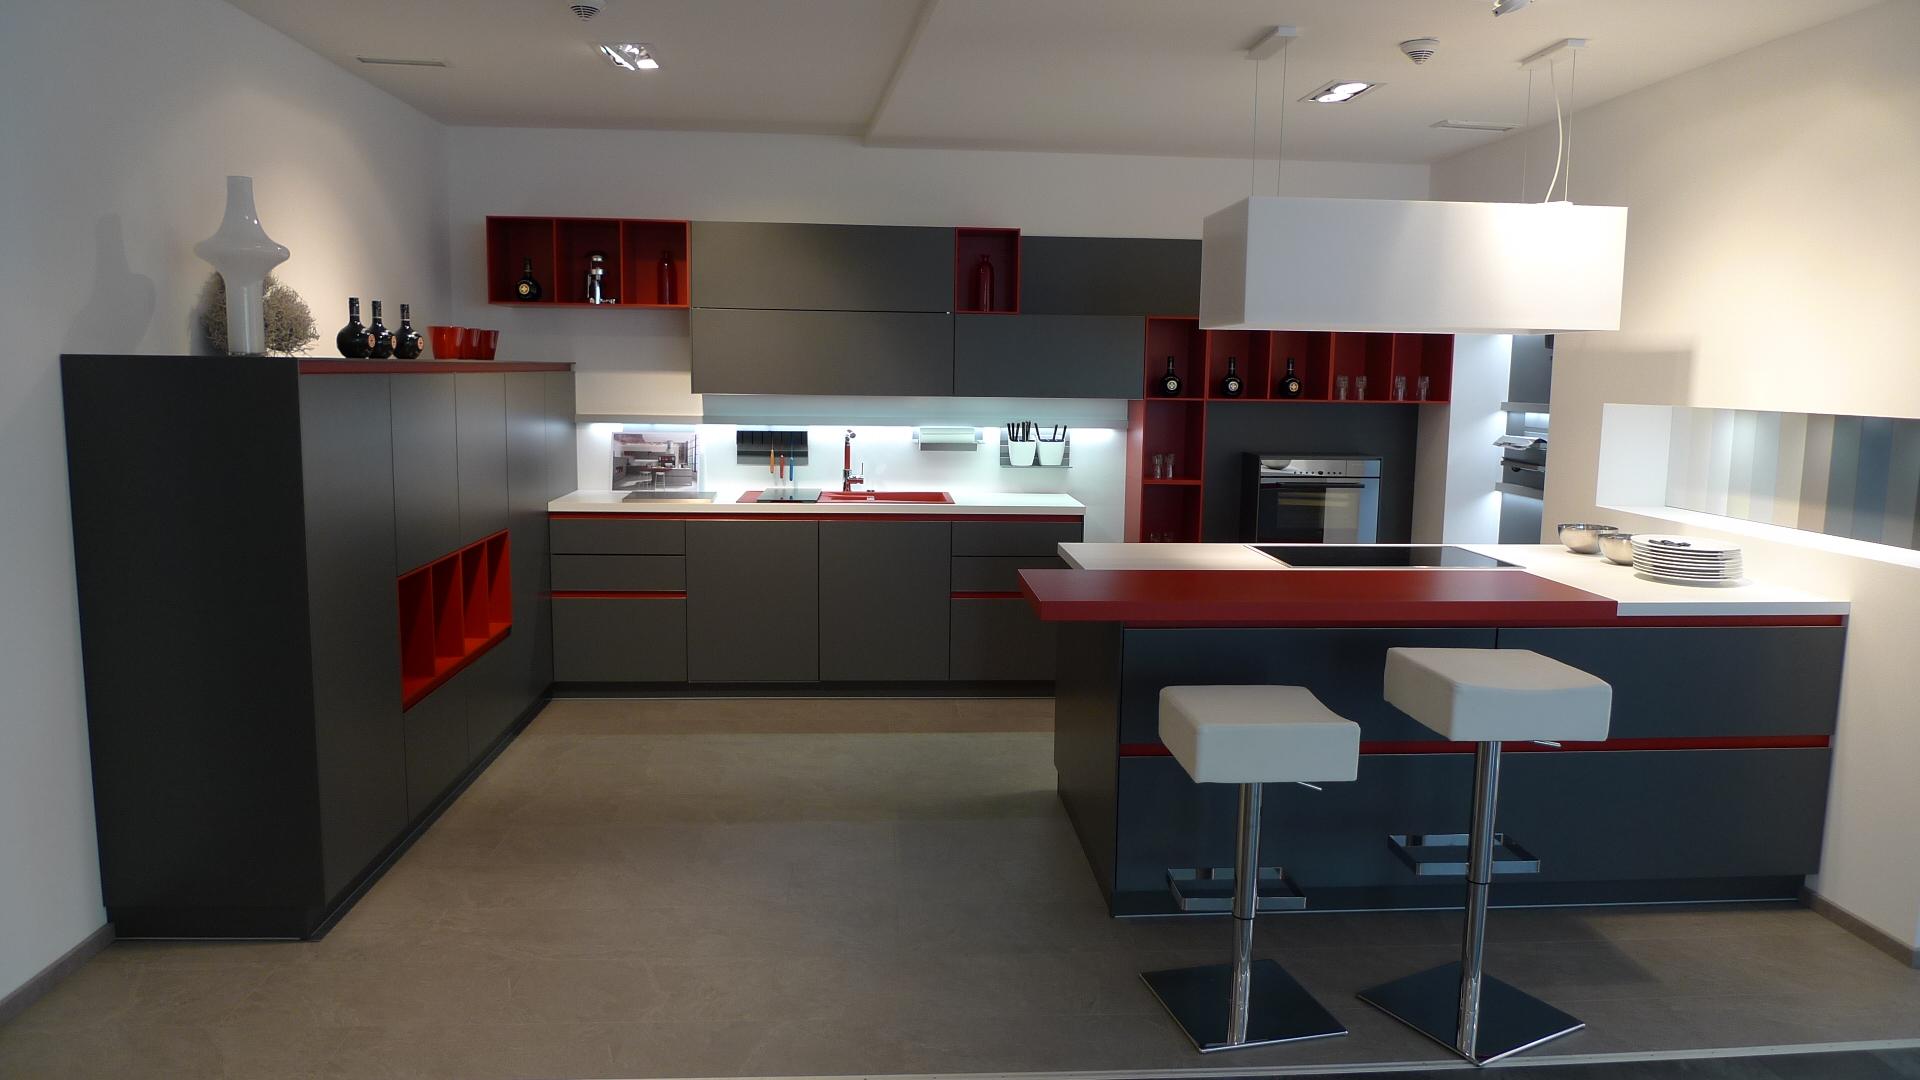 Design keukens antwerpen interieur meubilair idee n for Interieur antwerpen